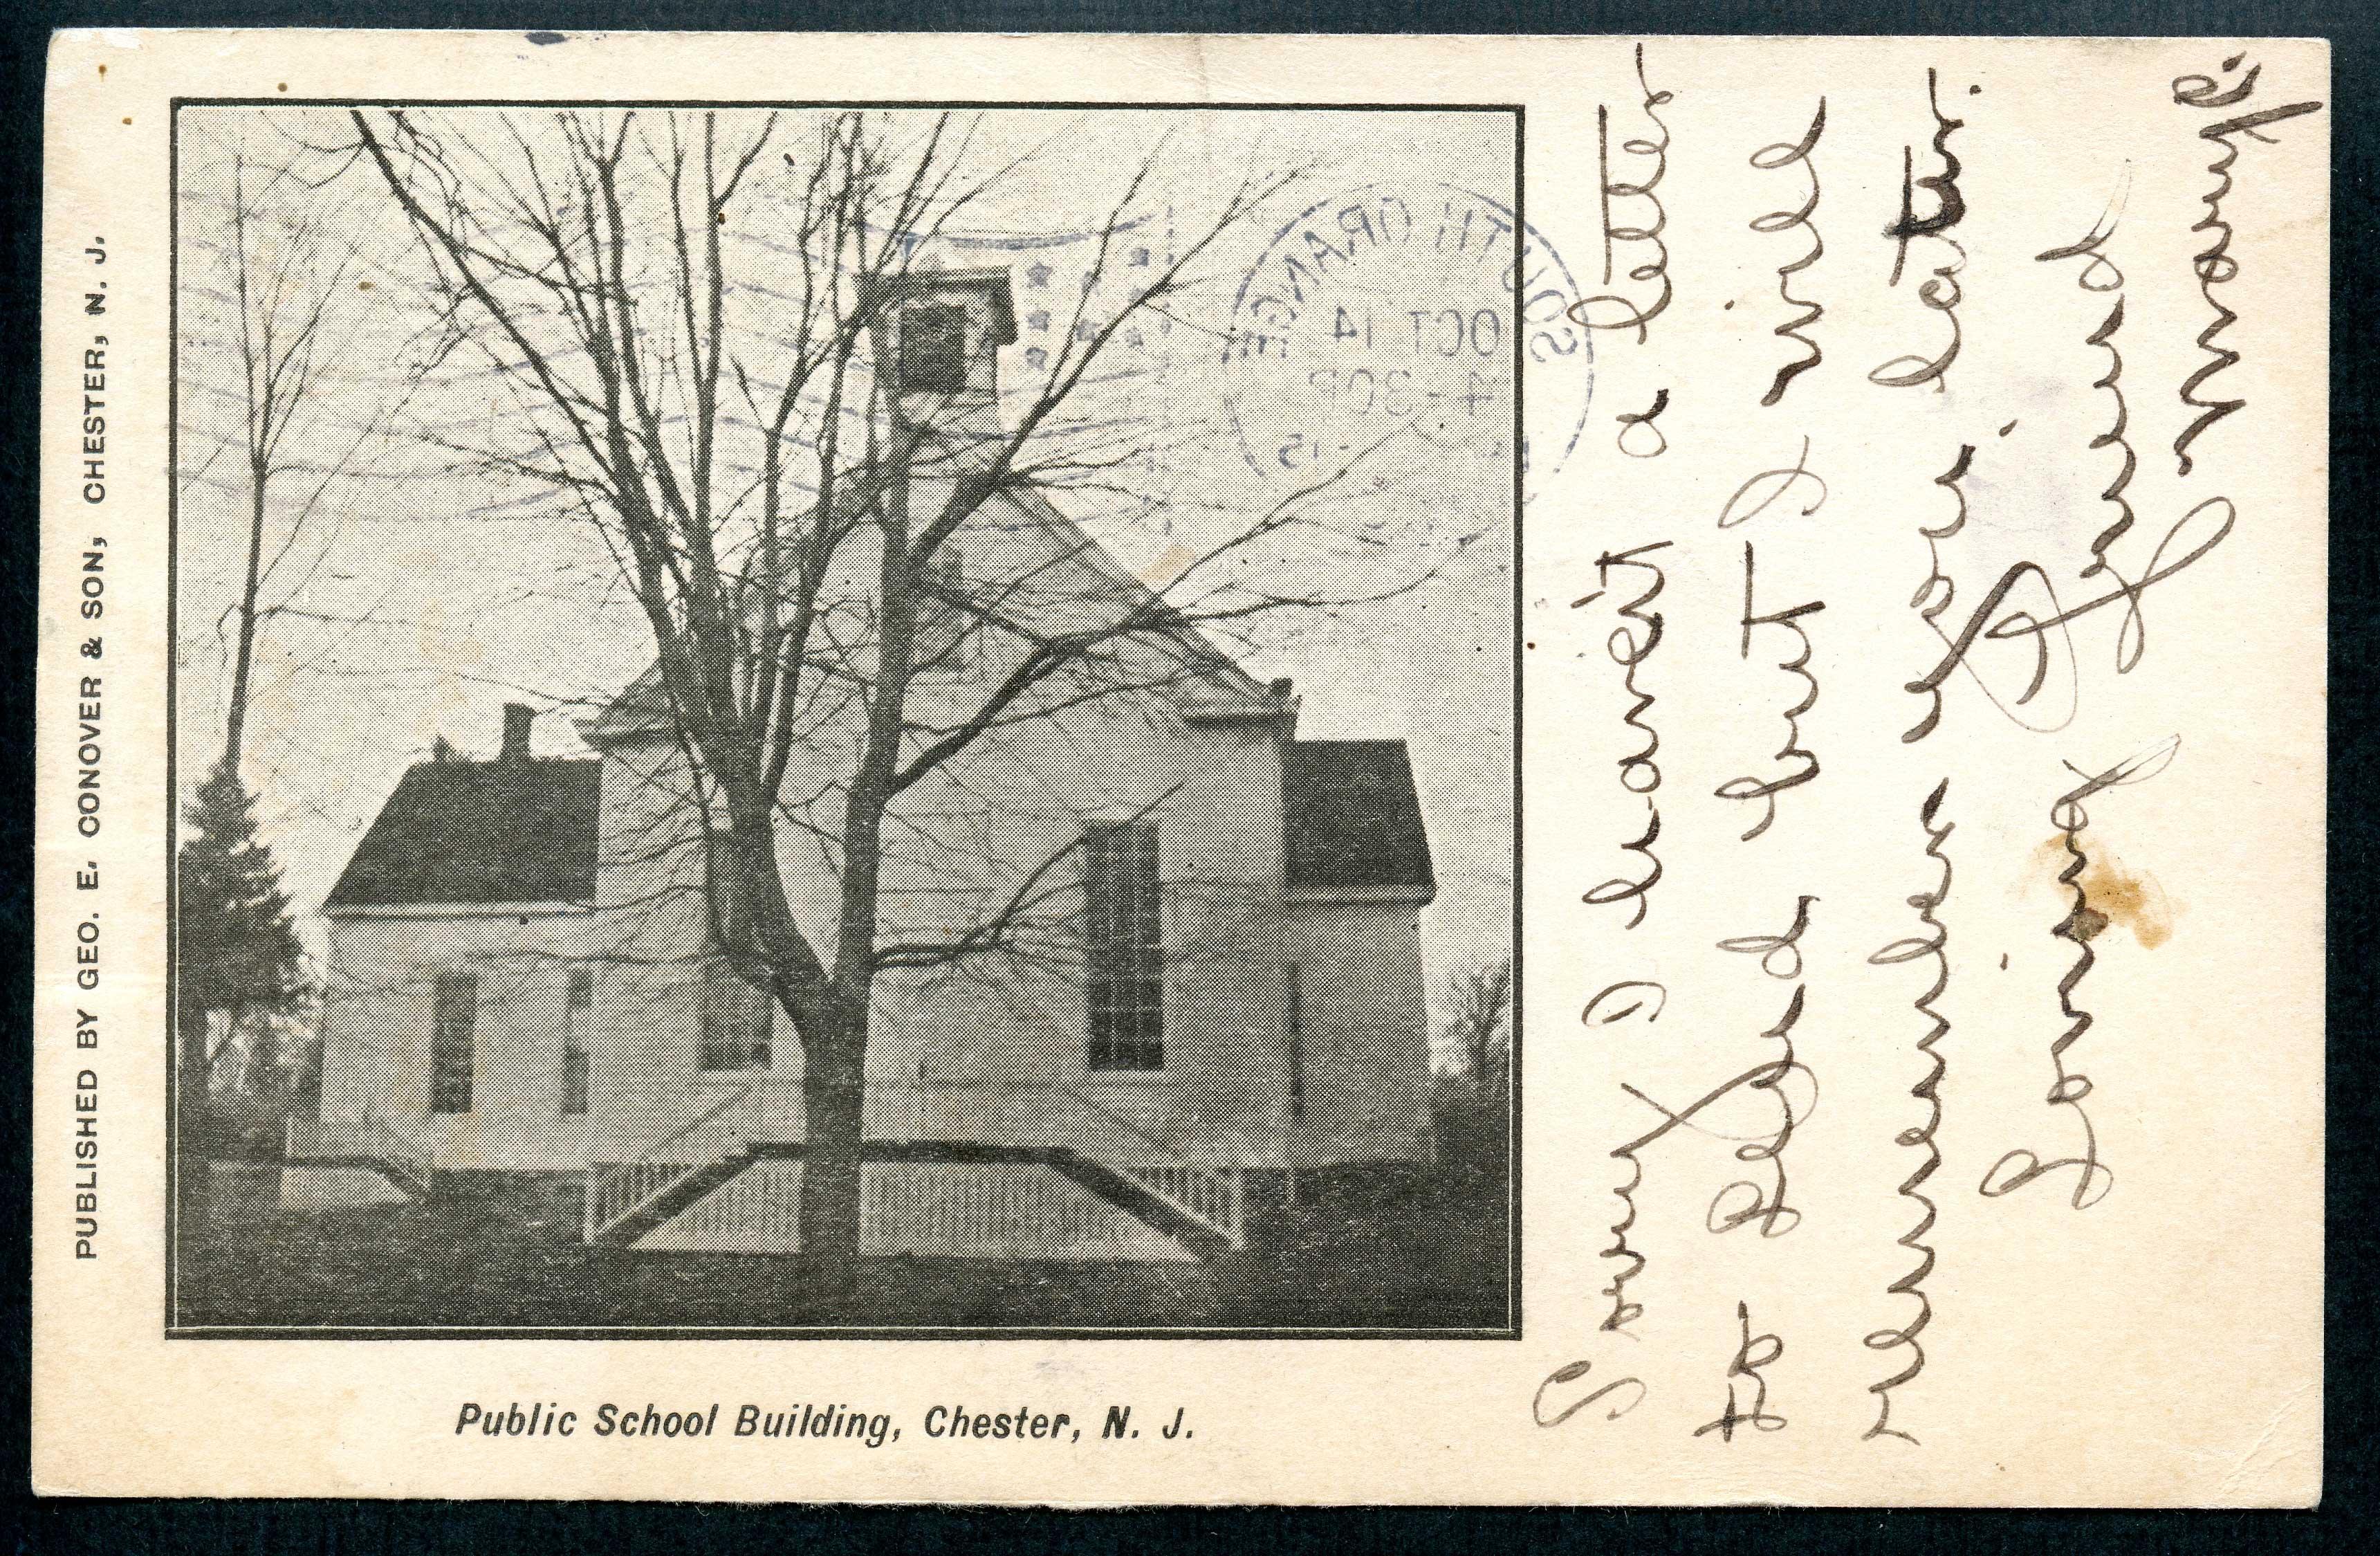 1905 Public School Building Post Card